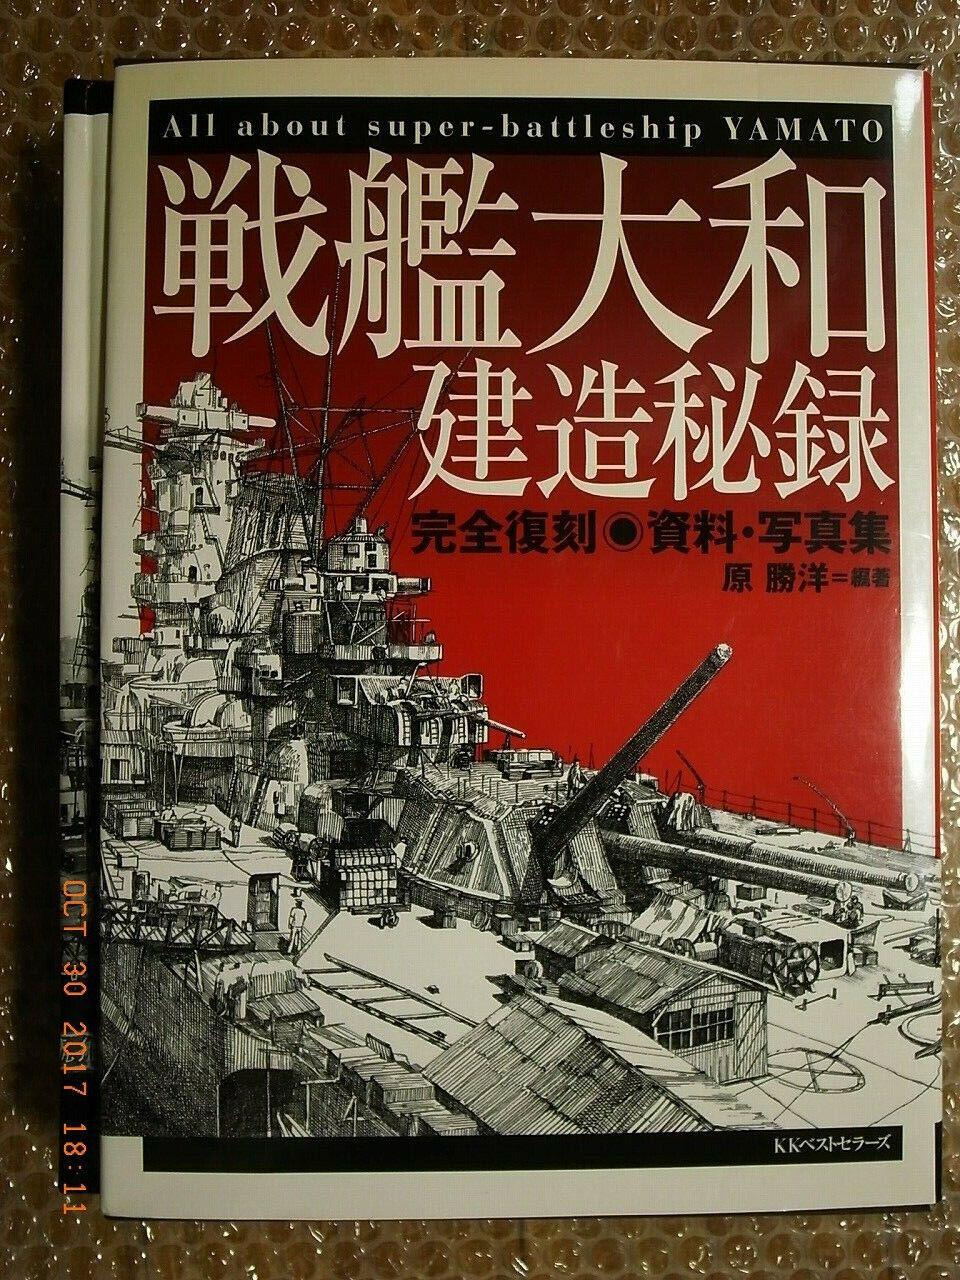 IJN BATTLESHIP YAMATO PLANS, PHOTOS COLLECTION, K.K. BEST SELLERS, JAPAN